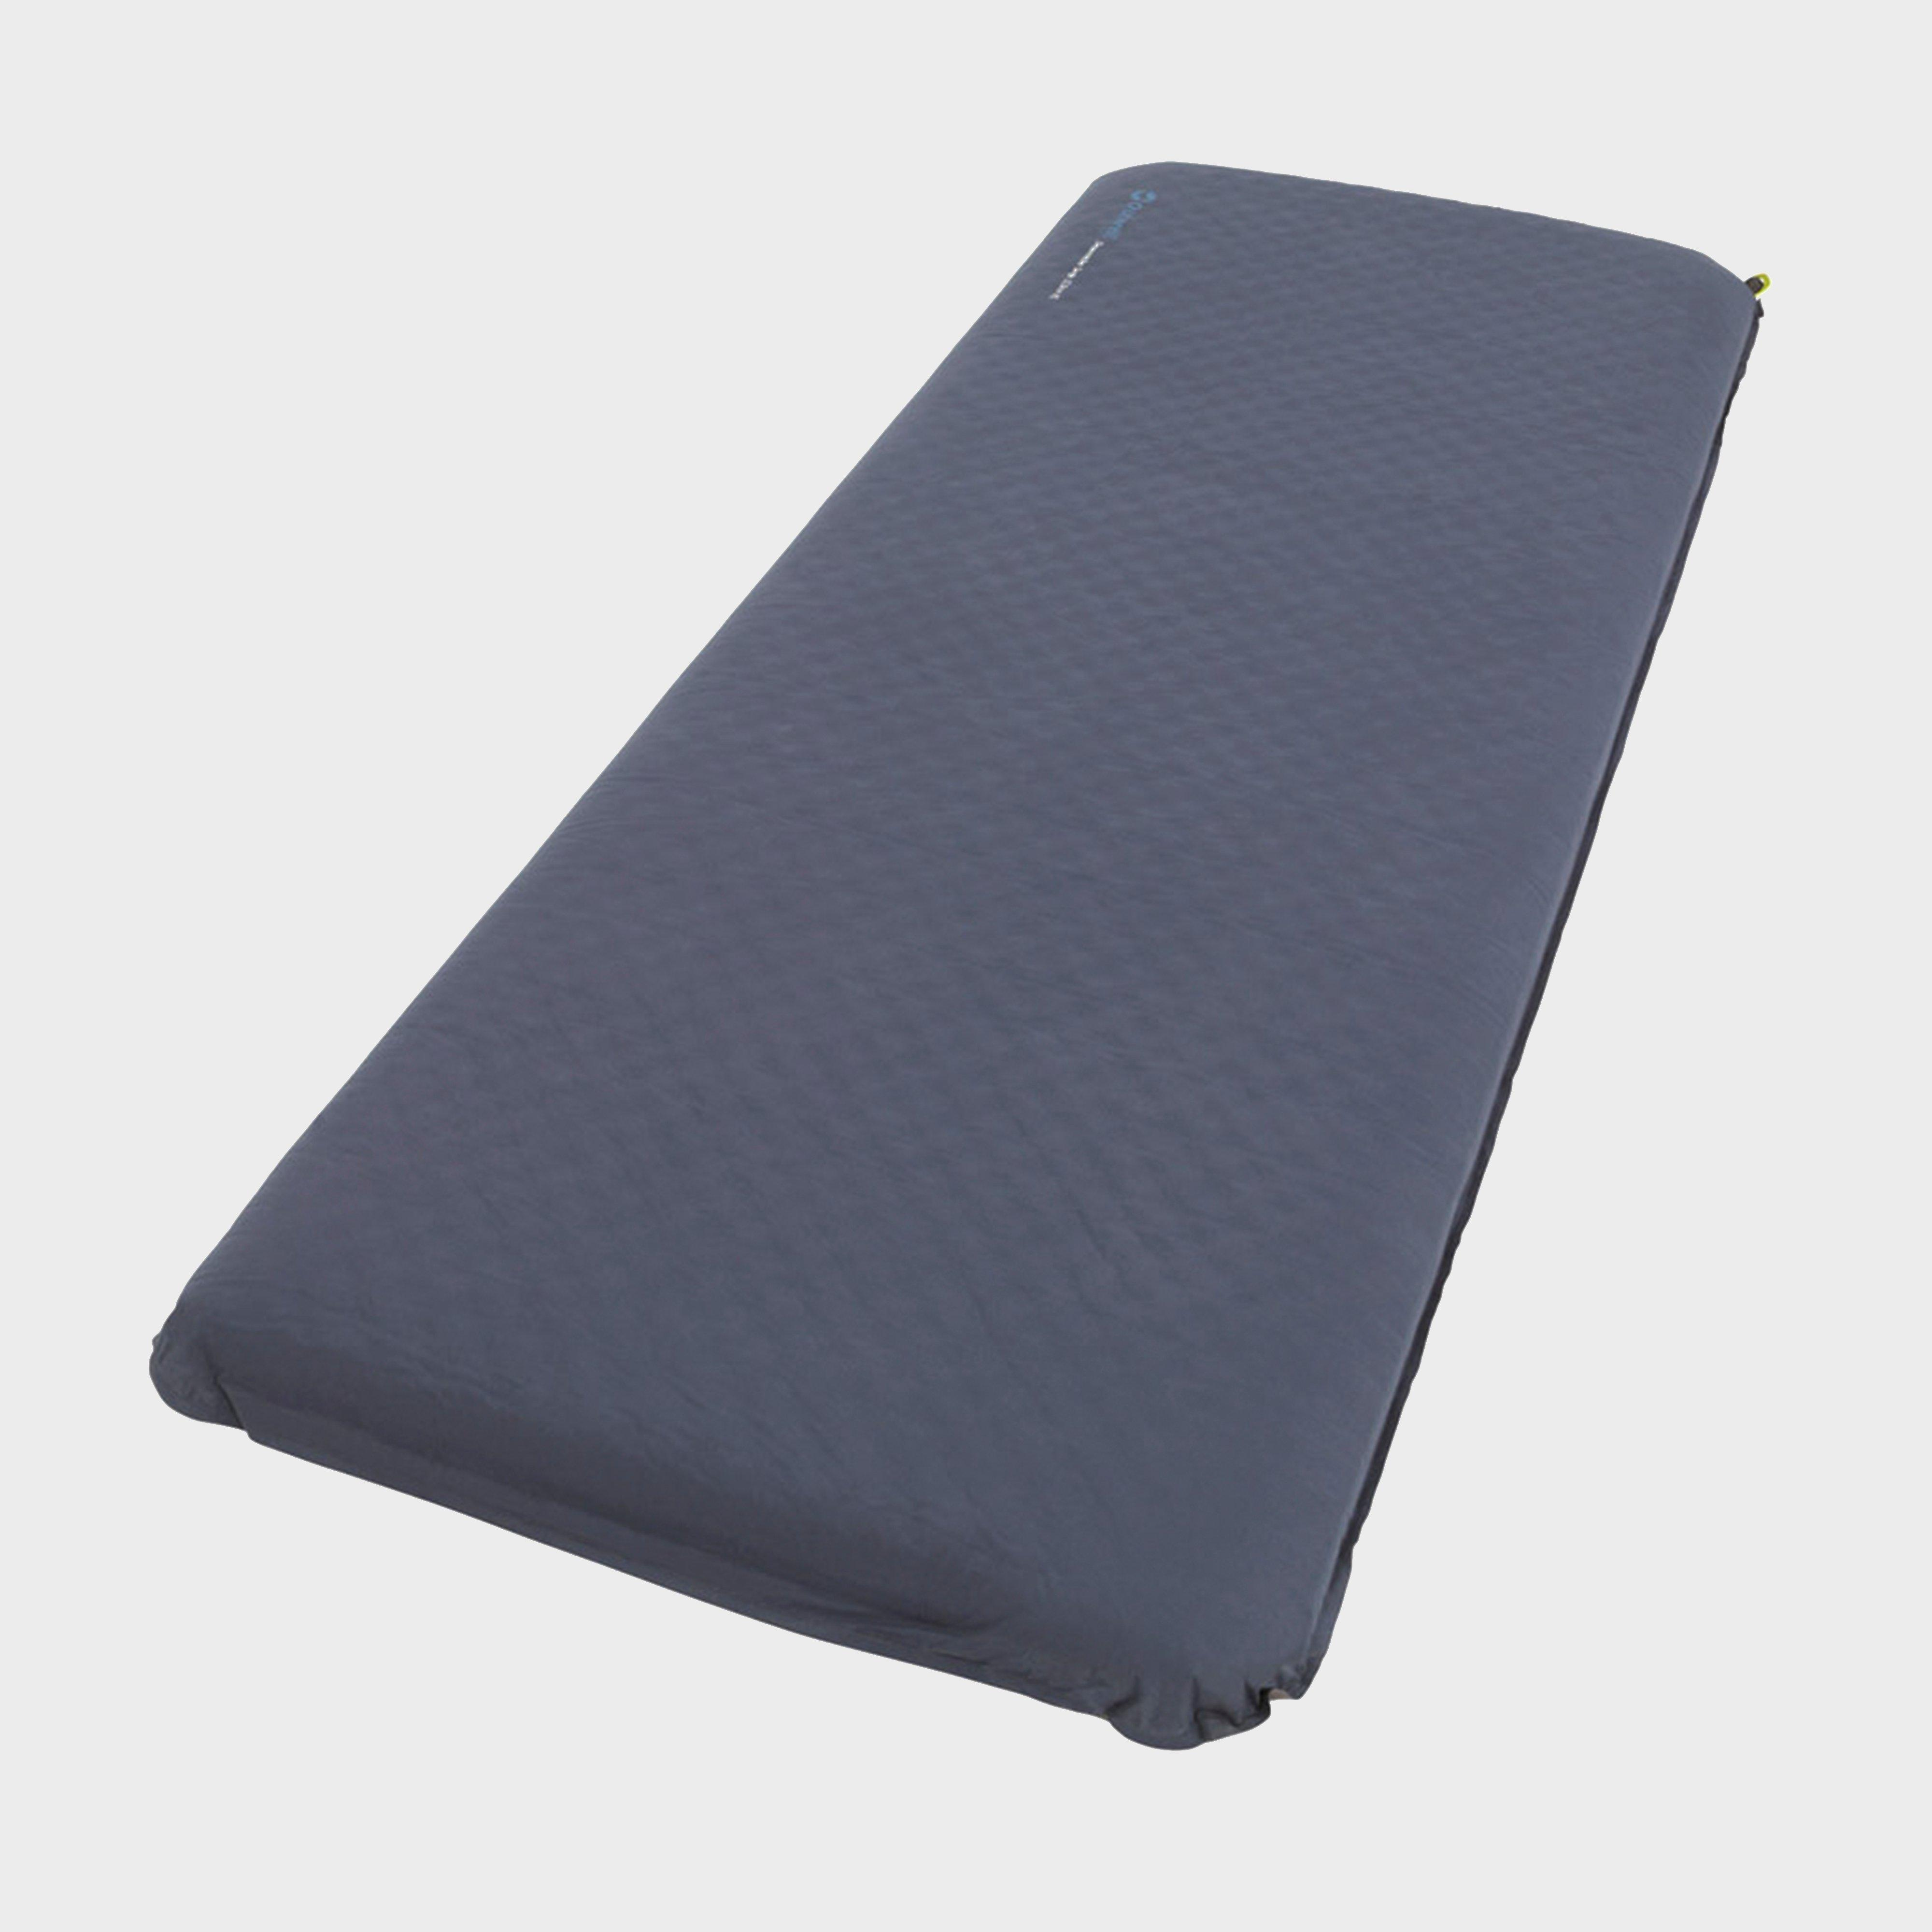 Outwell Outwell Dreamcatcher Single Self-Inflating Sleeping Mat XL (12cm) - Navy, Navy